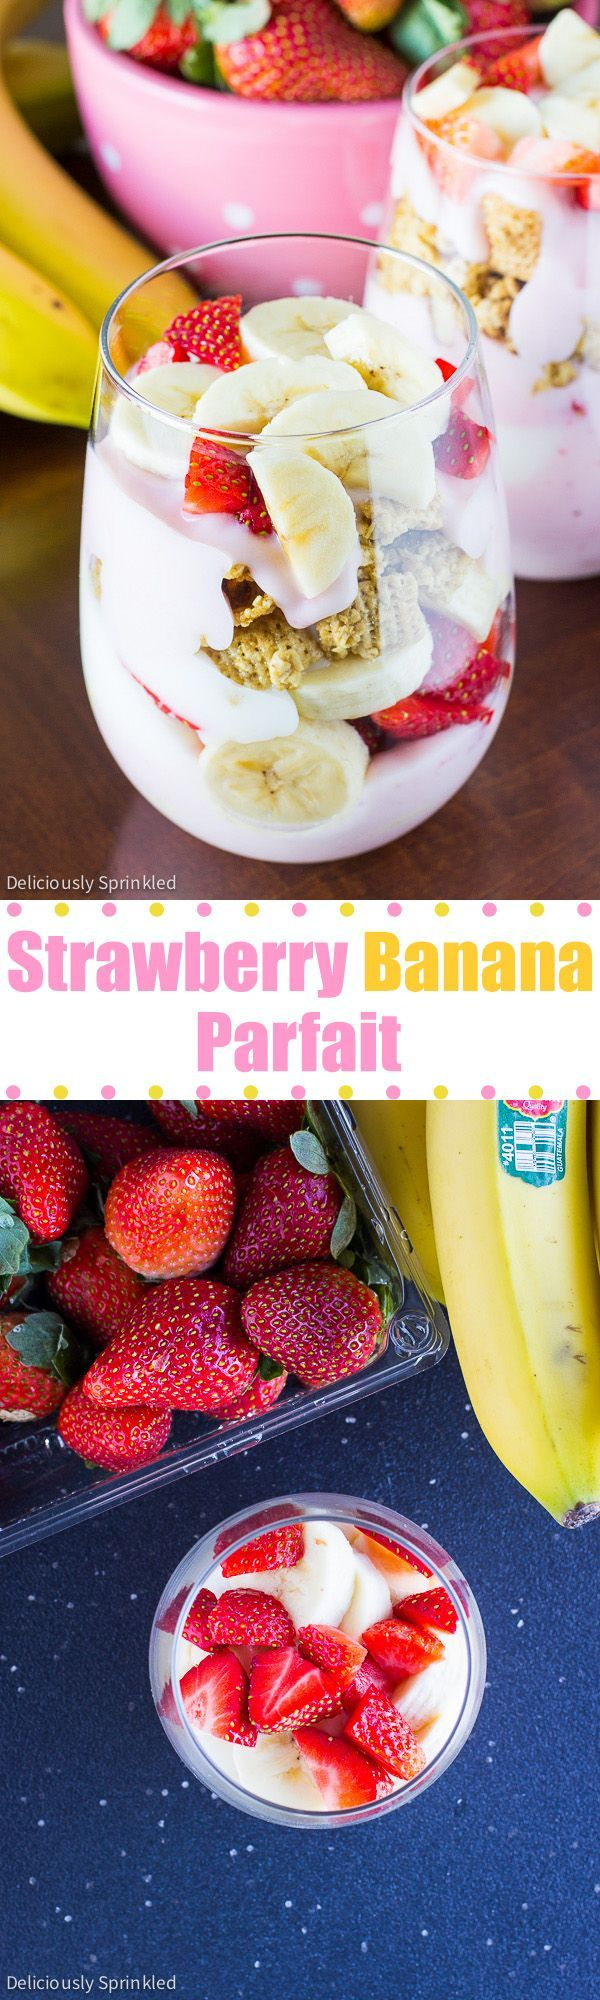 Strawberry Banana Yogurt Parfait- an easy and delicious breakfast parfait recipe!